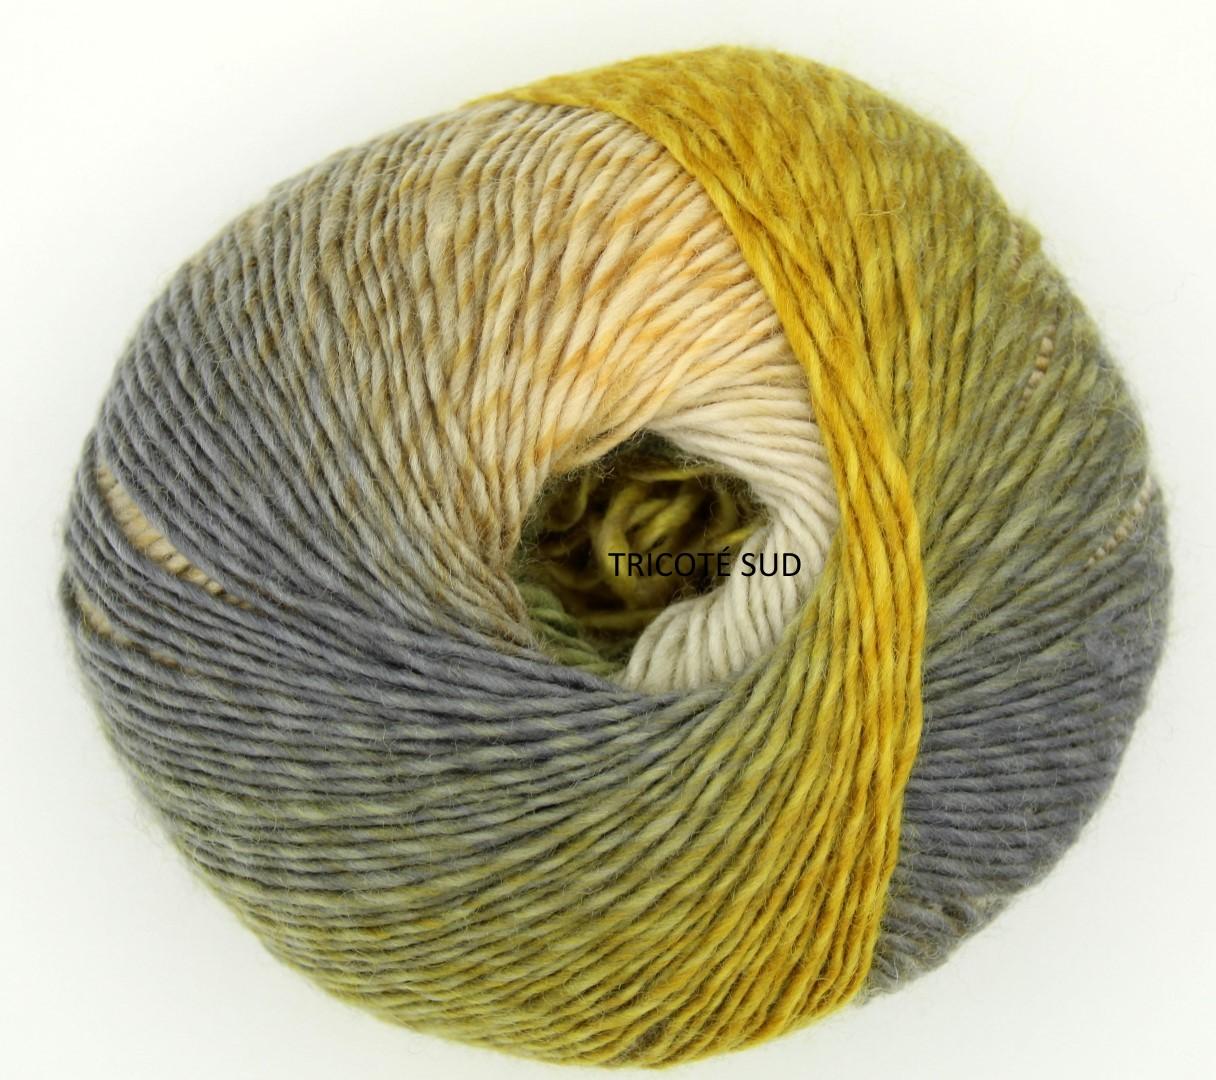 MILLE COLORI BABY LANG YARNS COLORIS 204 (1) (Large)